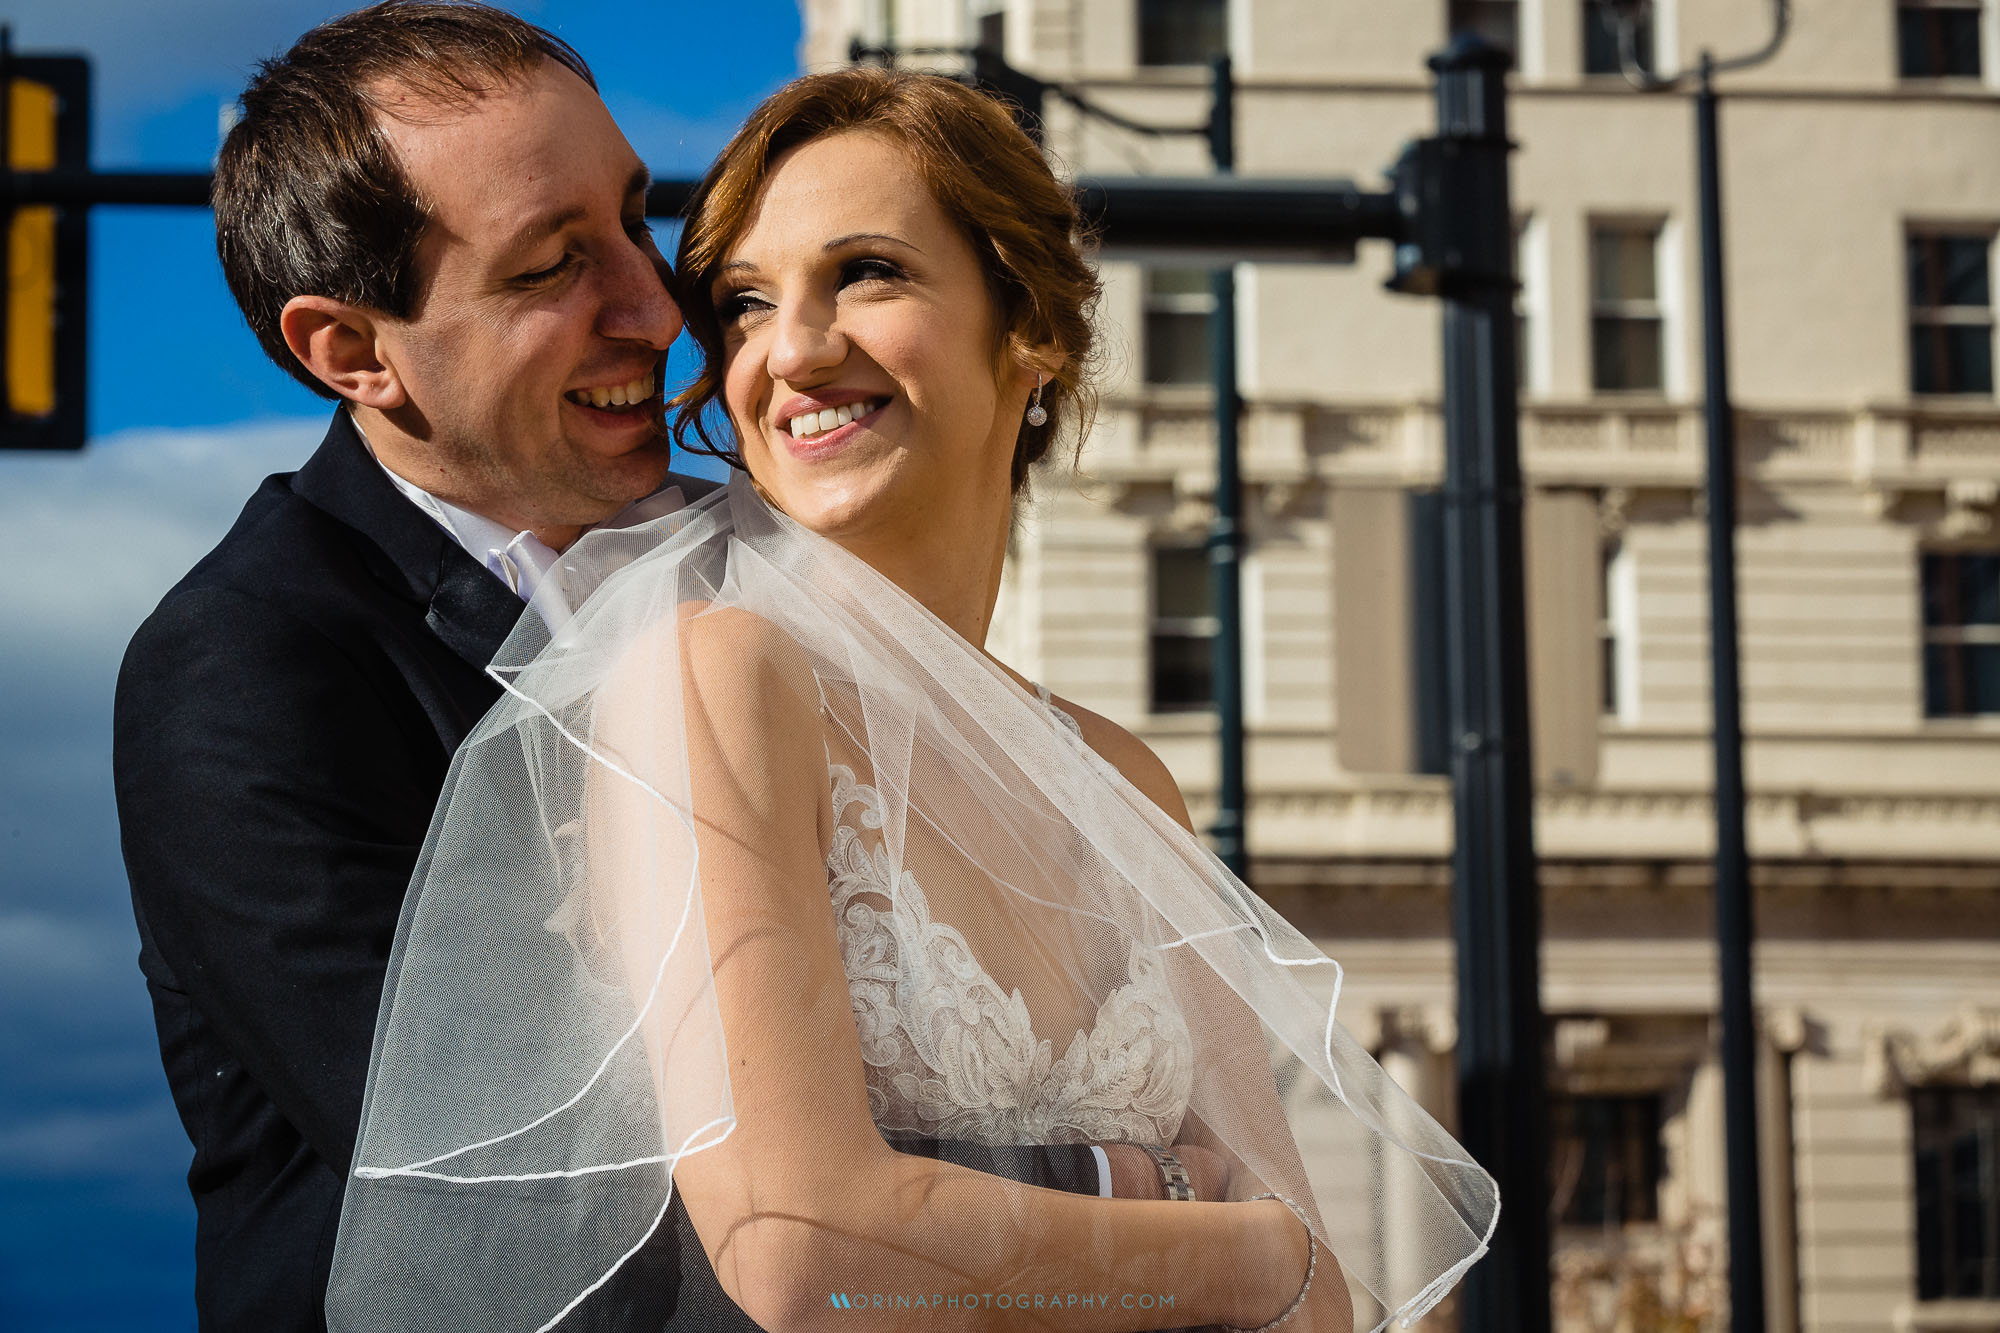 Ilhana & Jonathan Wedding at Vault 634 - Allentown 0048.jpg